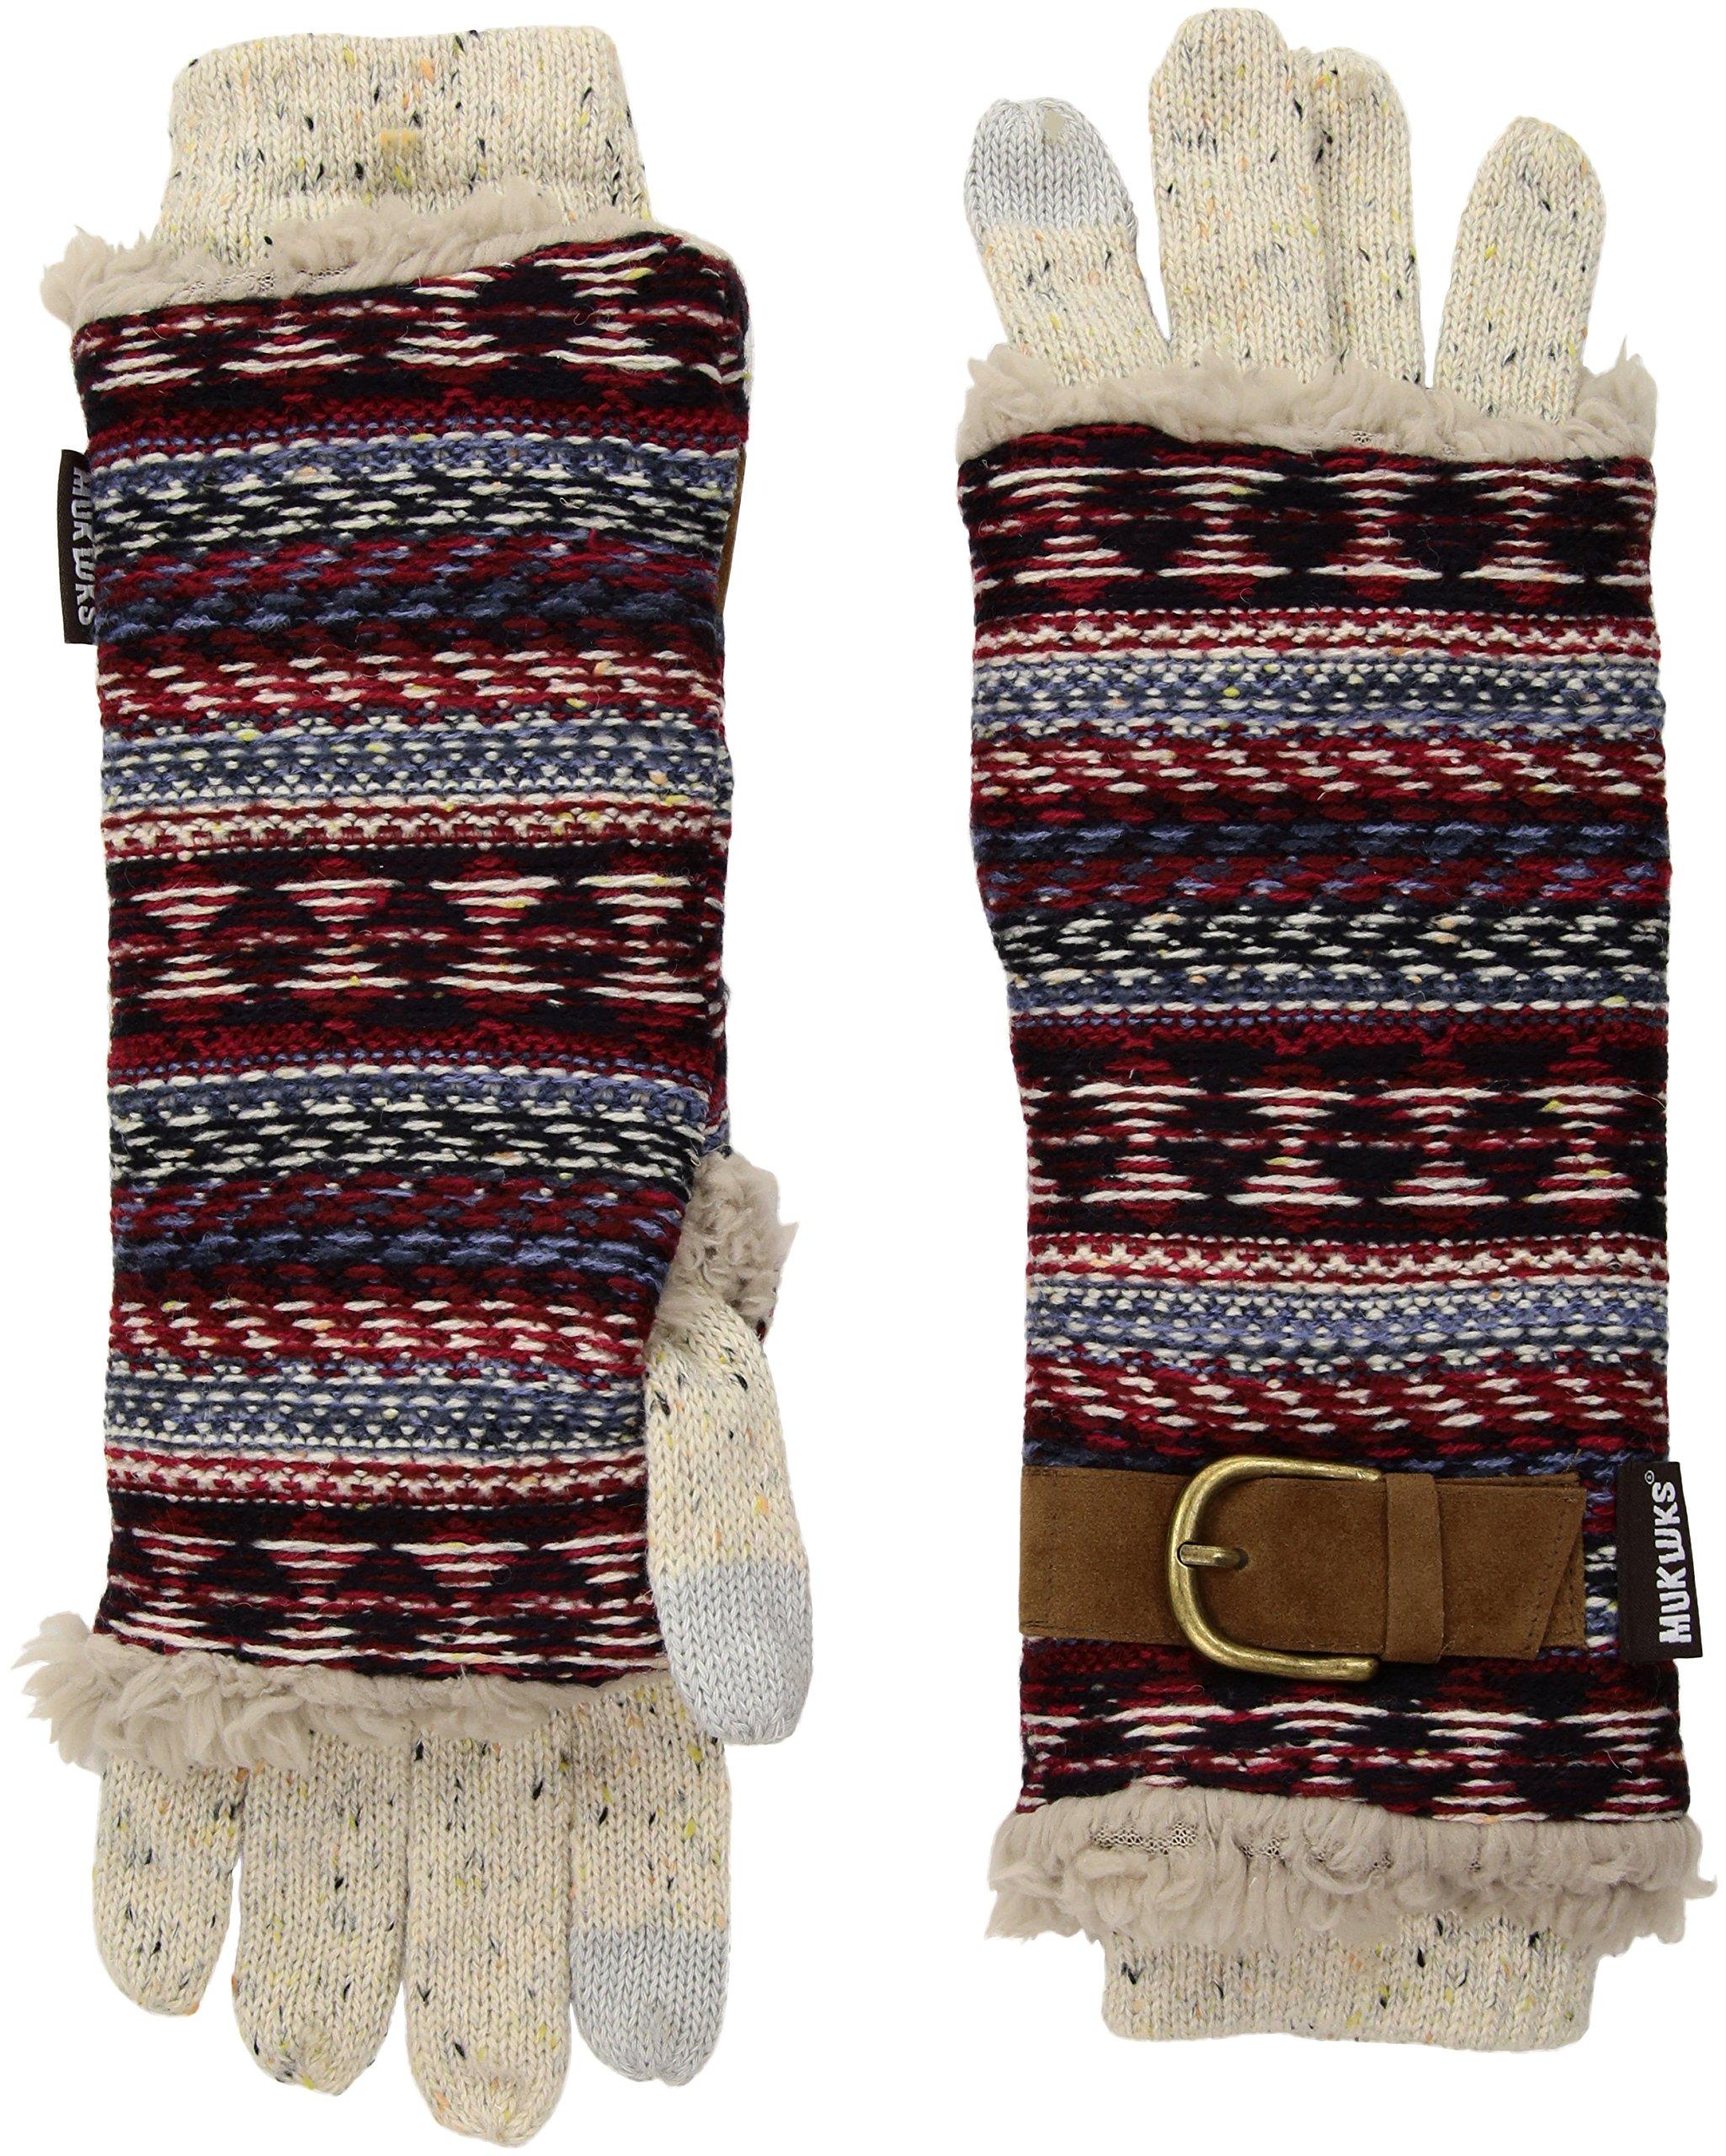 Muk Luks Women's 3-in-1 Gloves, Multi, One Size